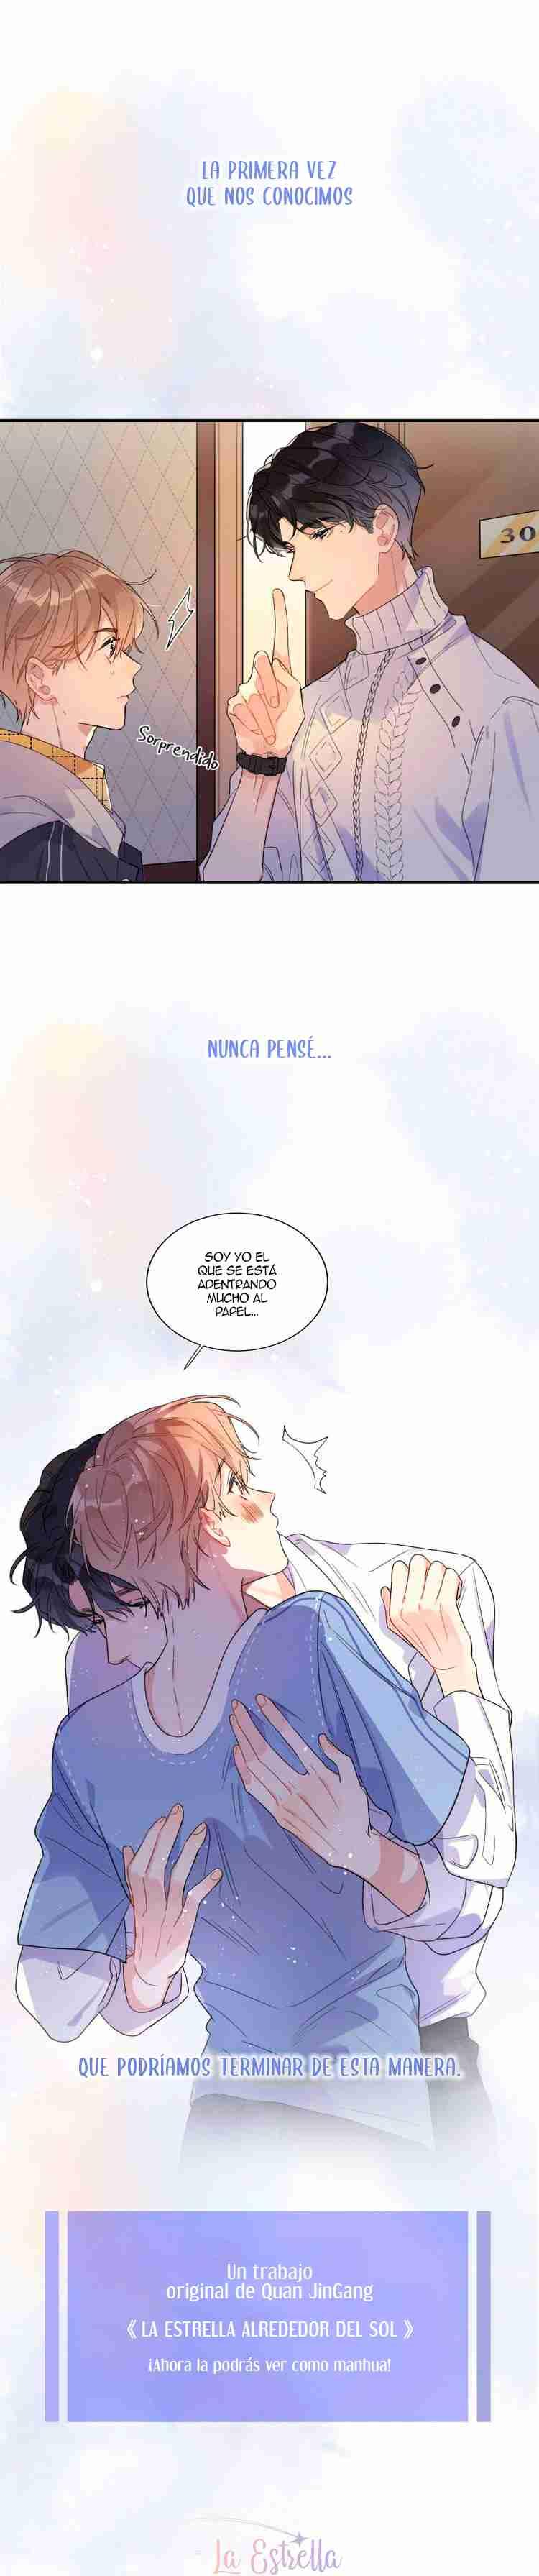 https://nine.mangadogs.com/es_manga/pic9/59/37627/969557/373590403f80d686f78b18a45ddd22ef.jpg Page 1